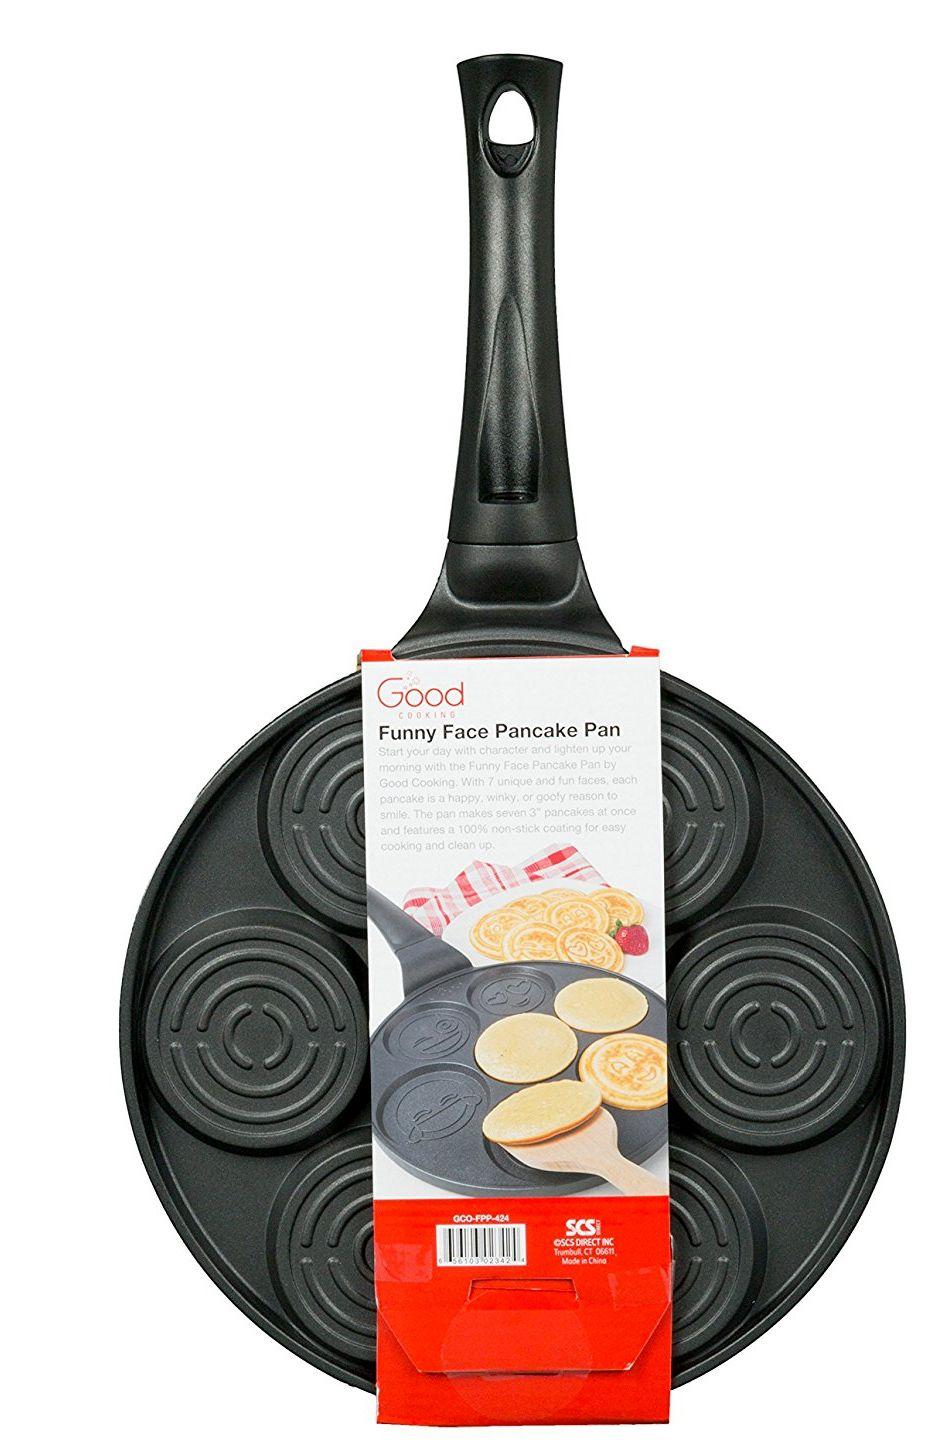 Frigideira-de-Panquecas-Emoji-Smiley-Face-Pancake-Pan-04